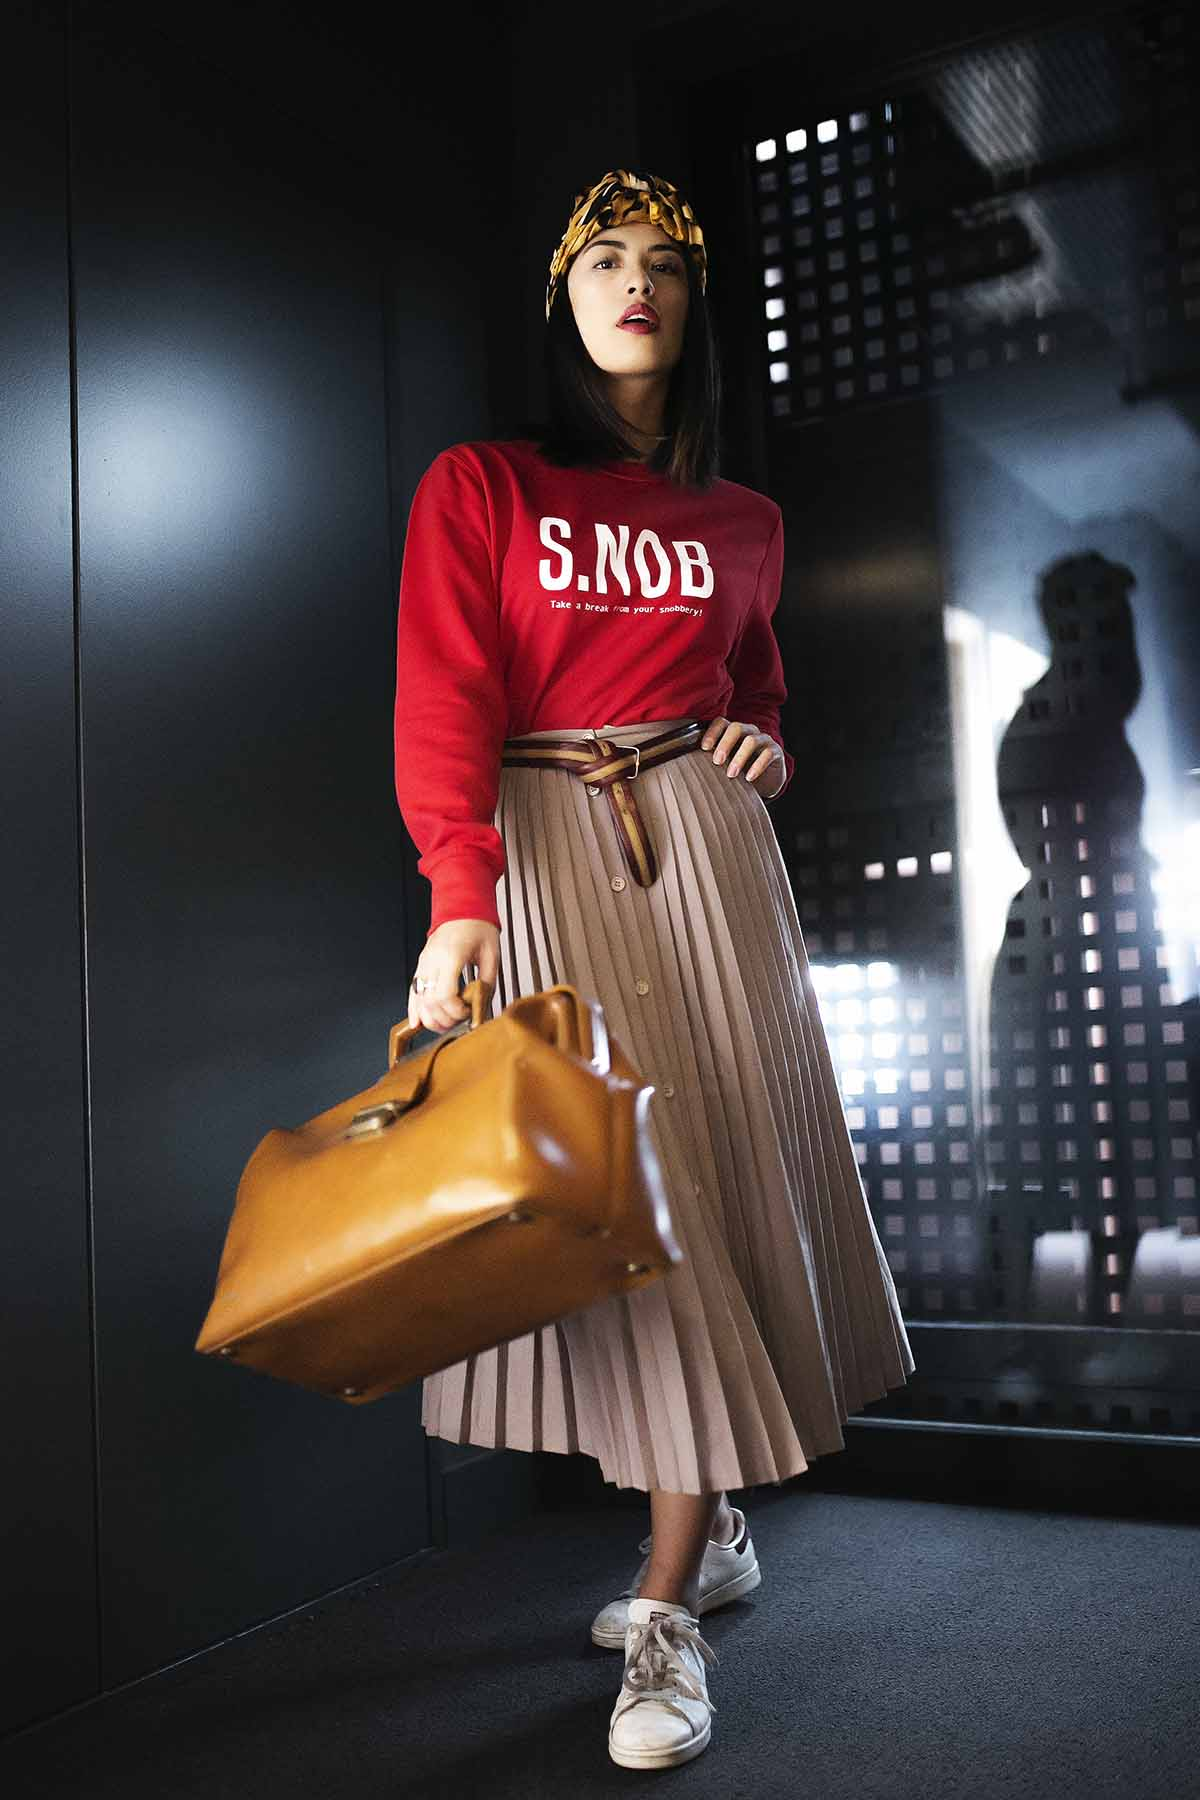 Sweatshirt rouge s.nob imprimé femme